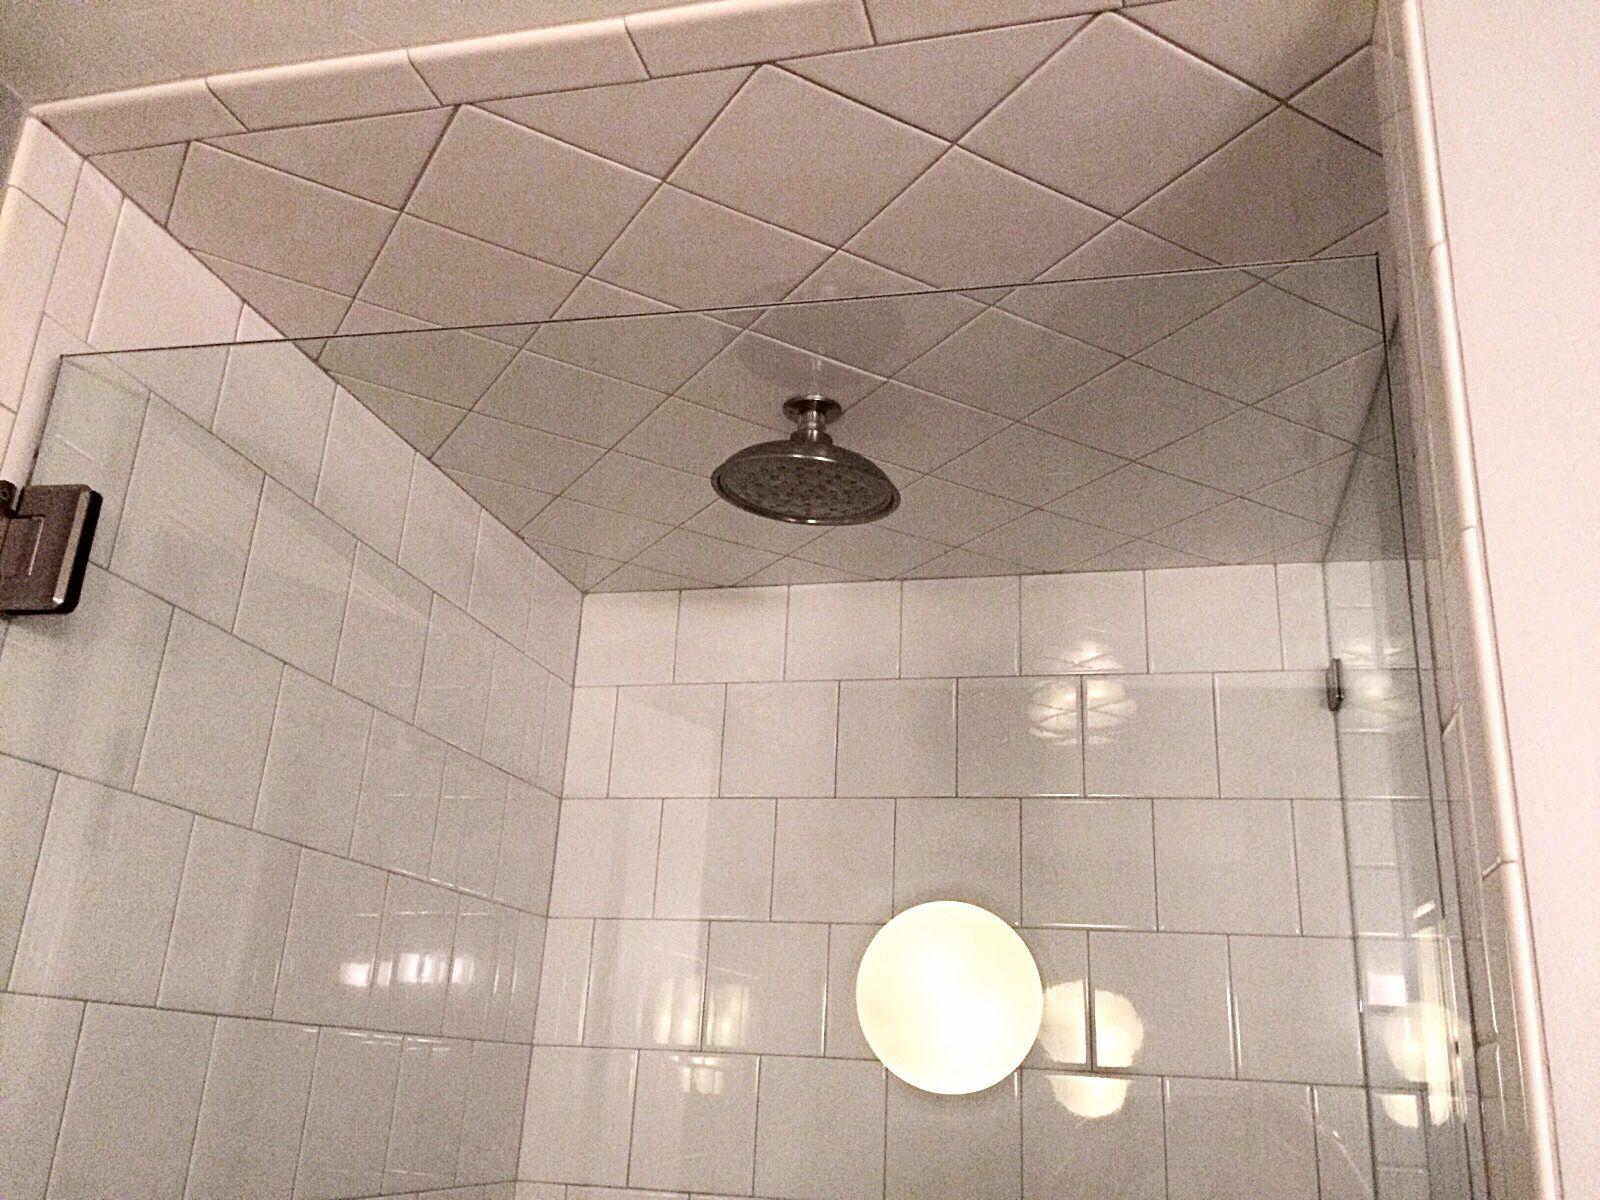 custom 4x4 subway tile walls with